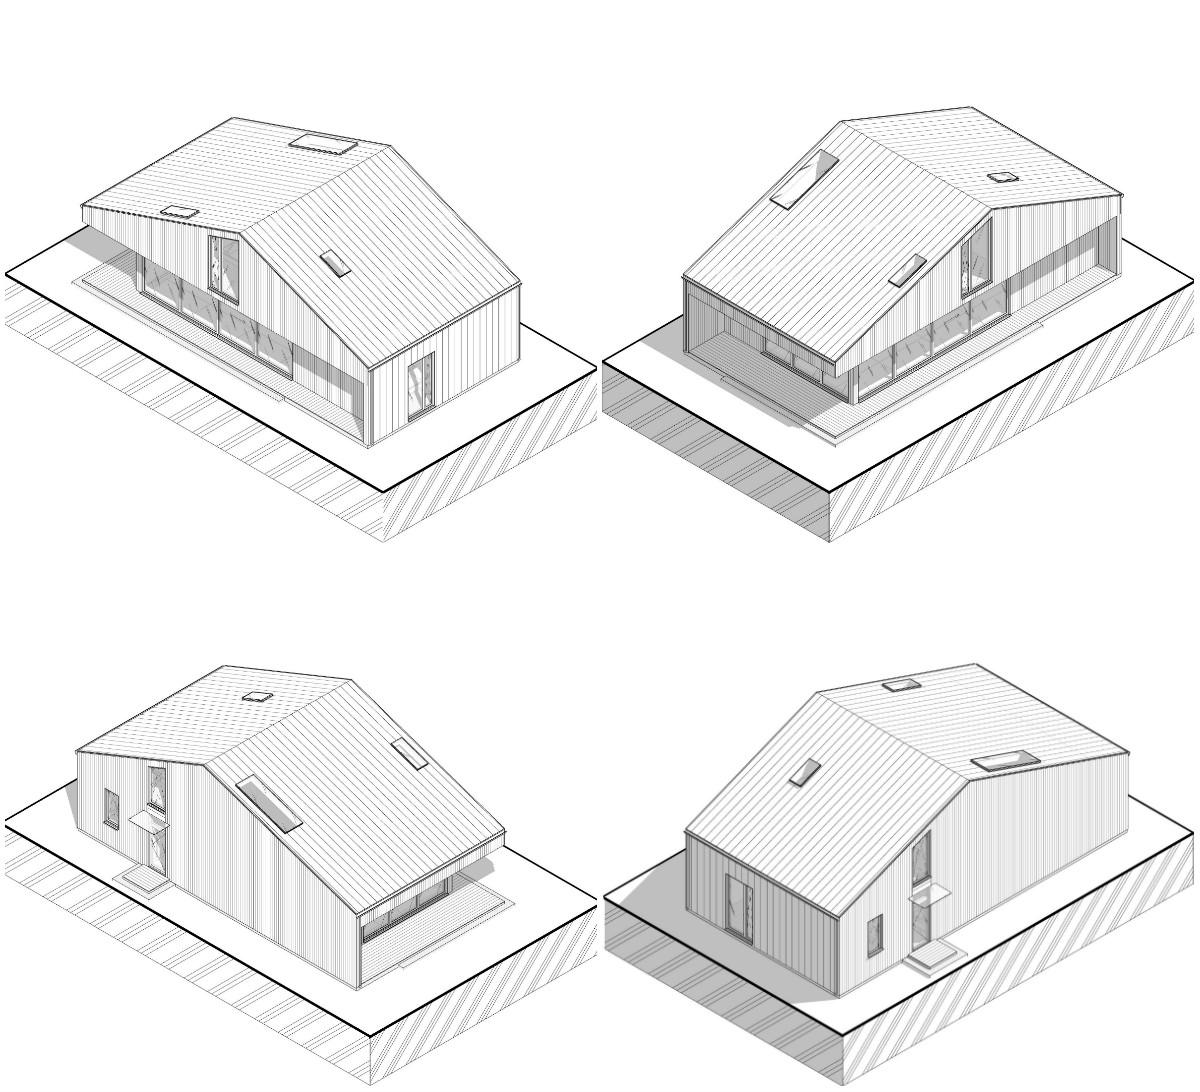 hilltop residence изометрический вид